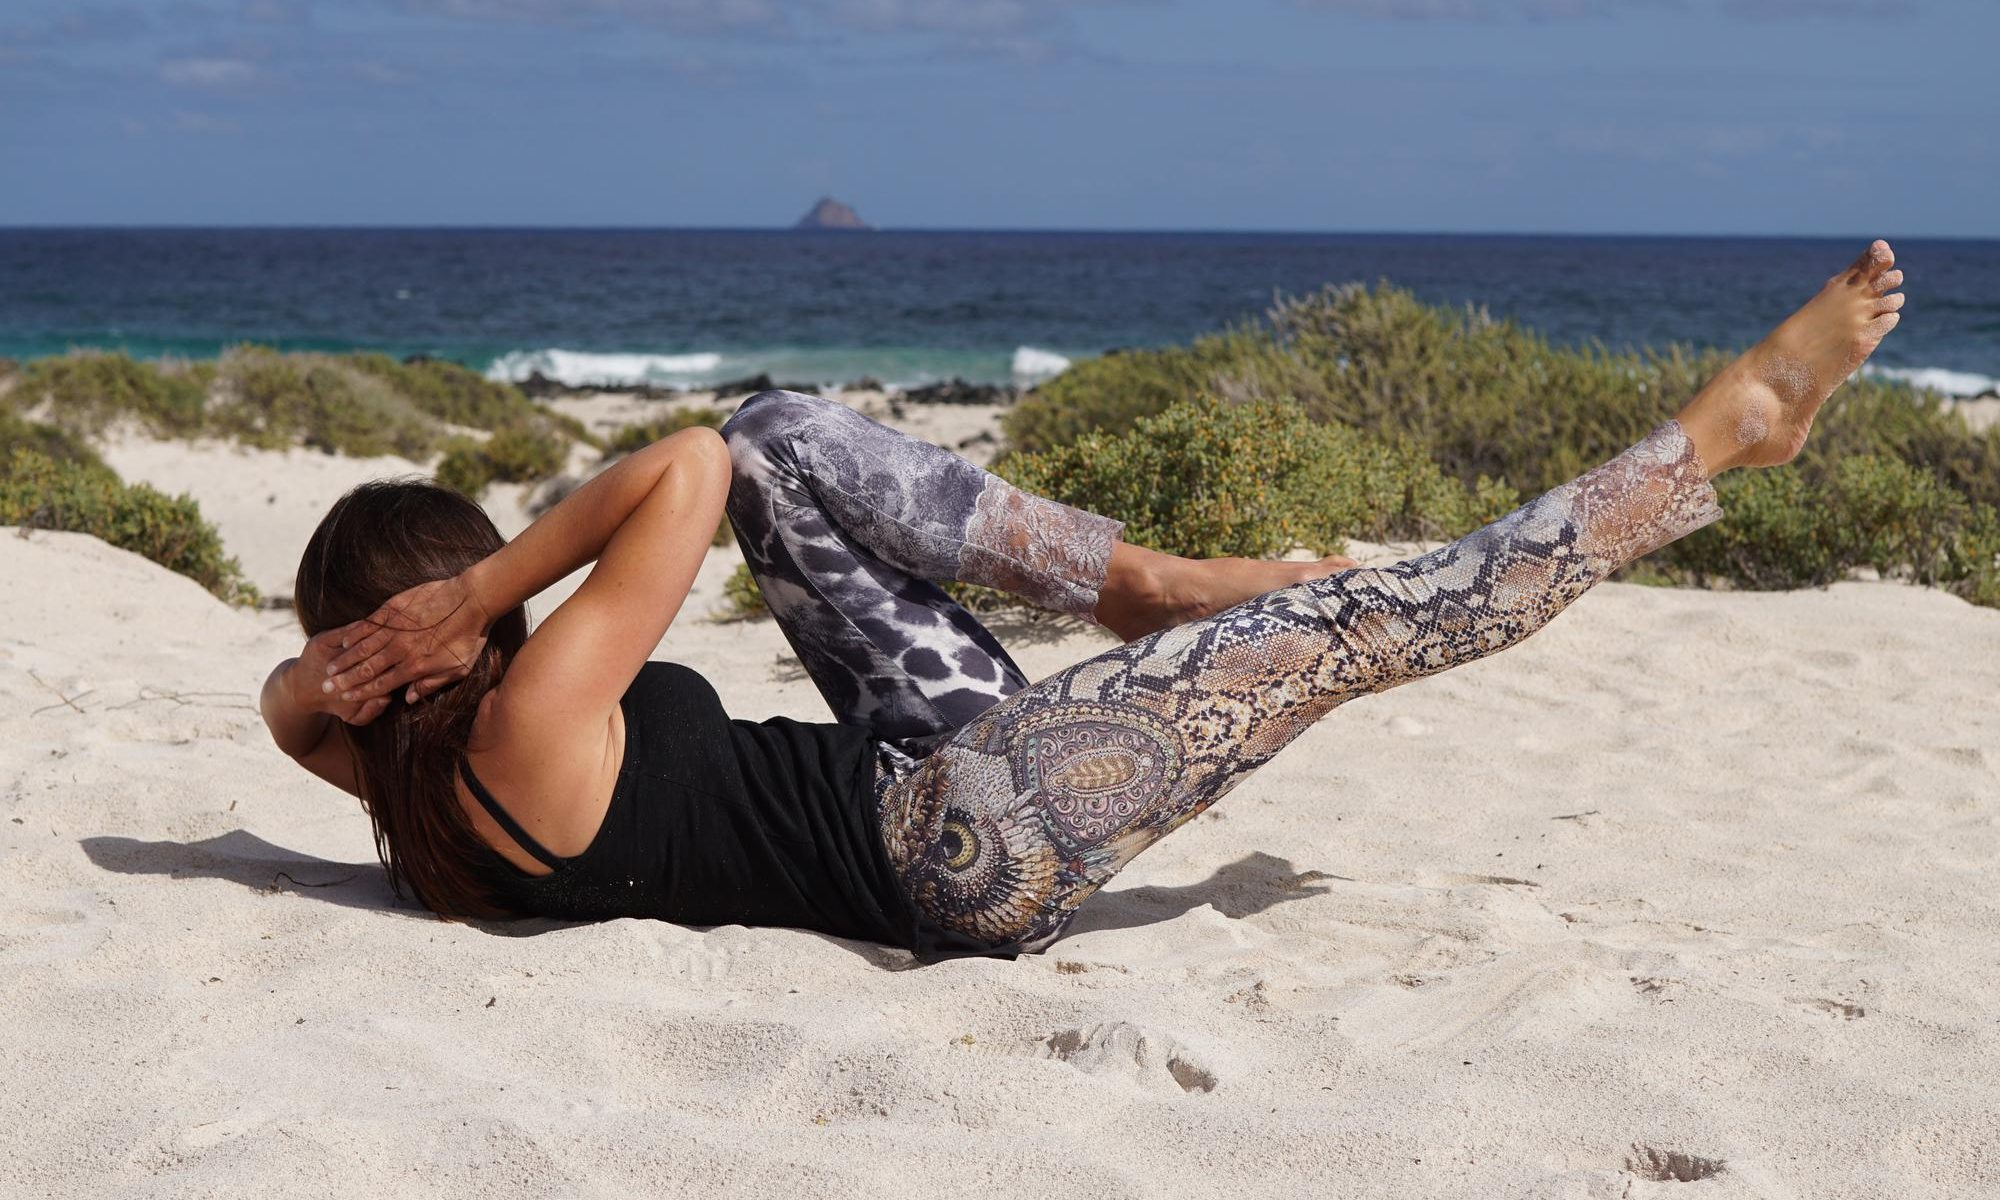 Pilates Lanzarote Strand - Studio of movement - Bettina Strauss